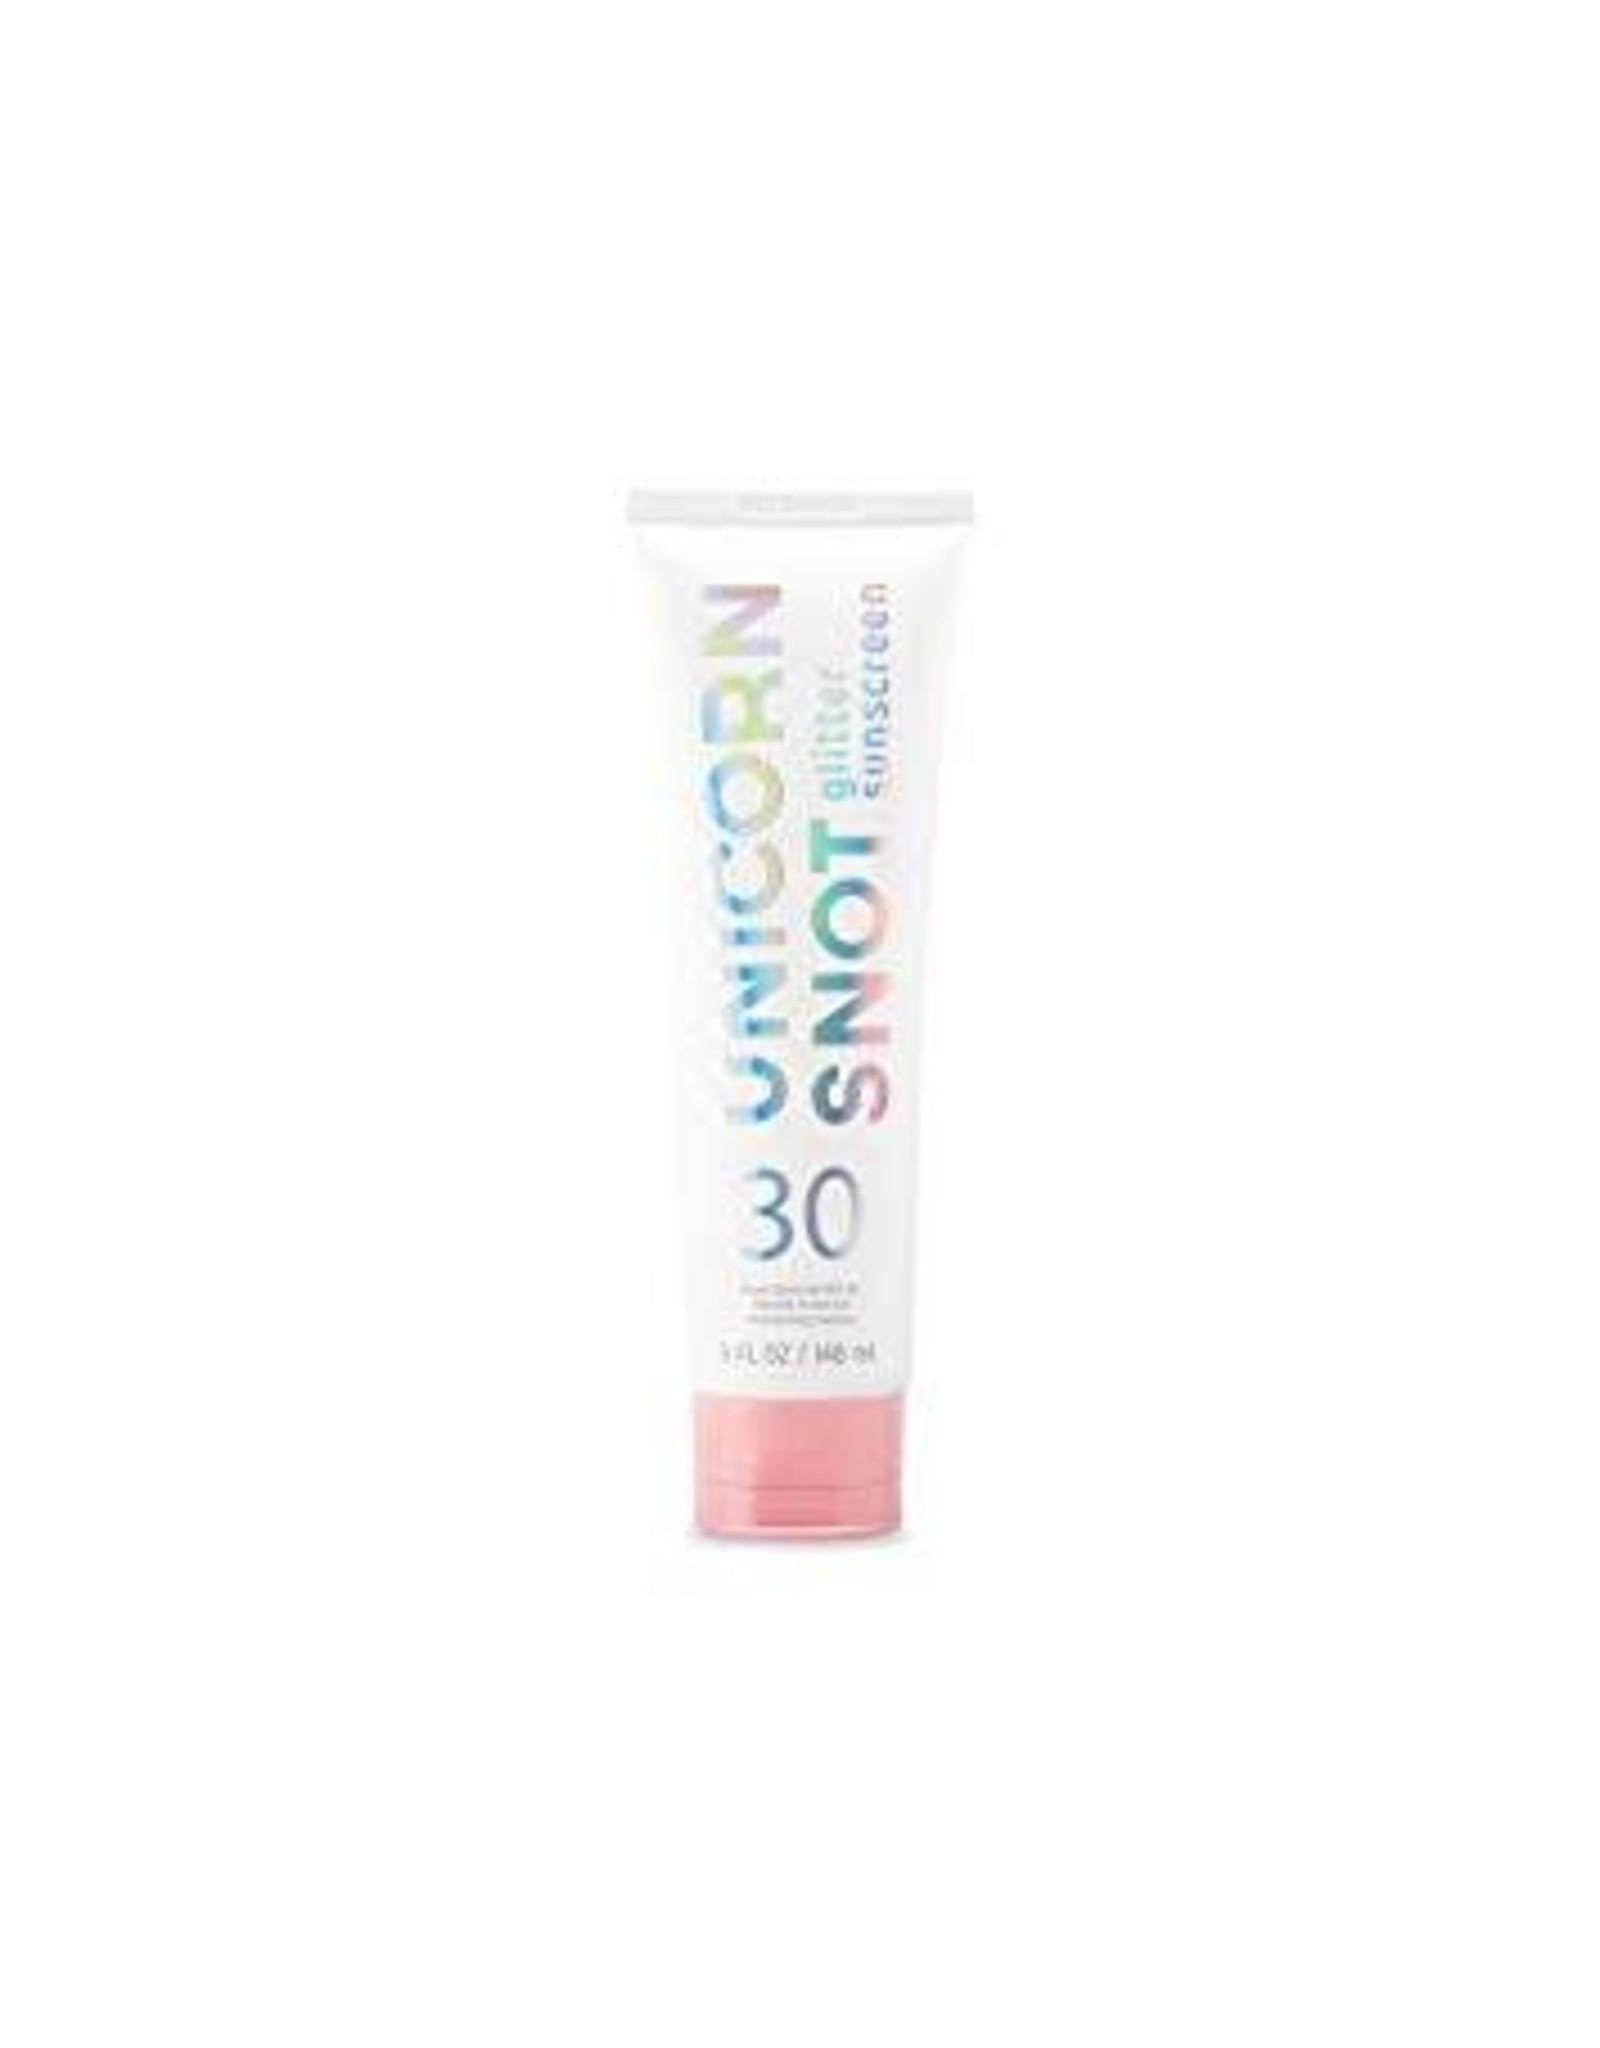 FCTRY Unicorn Snot Sunscreen